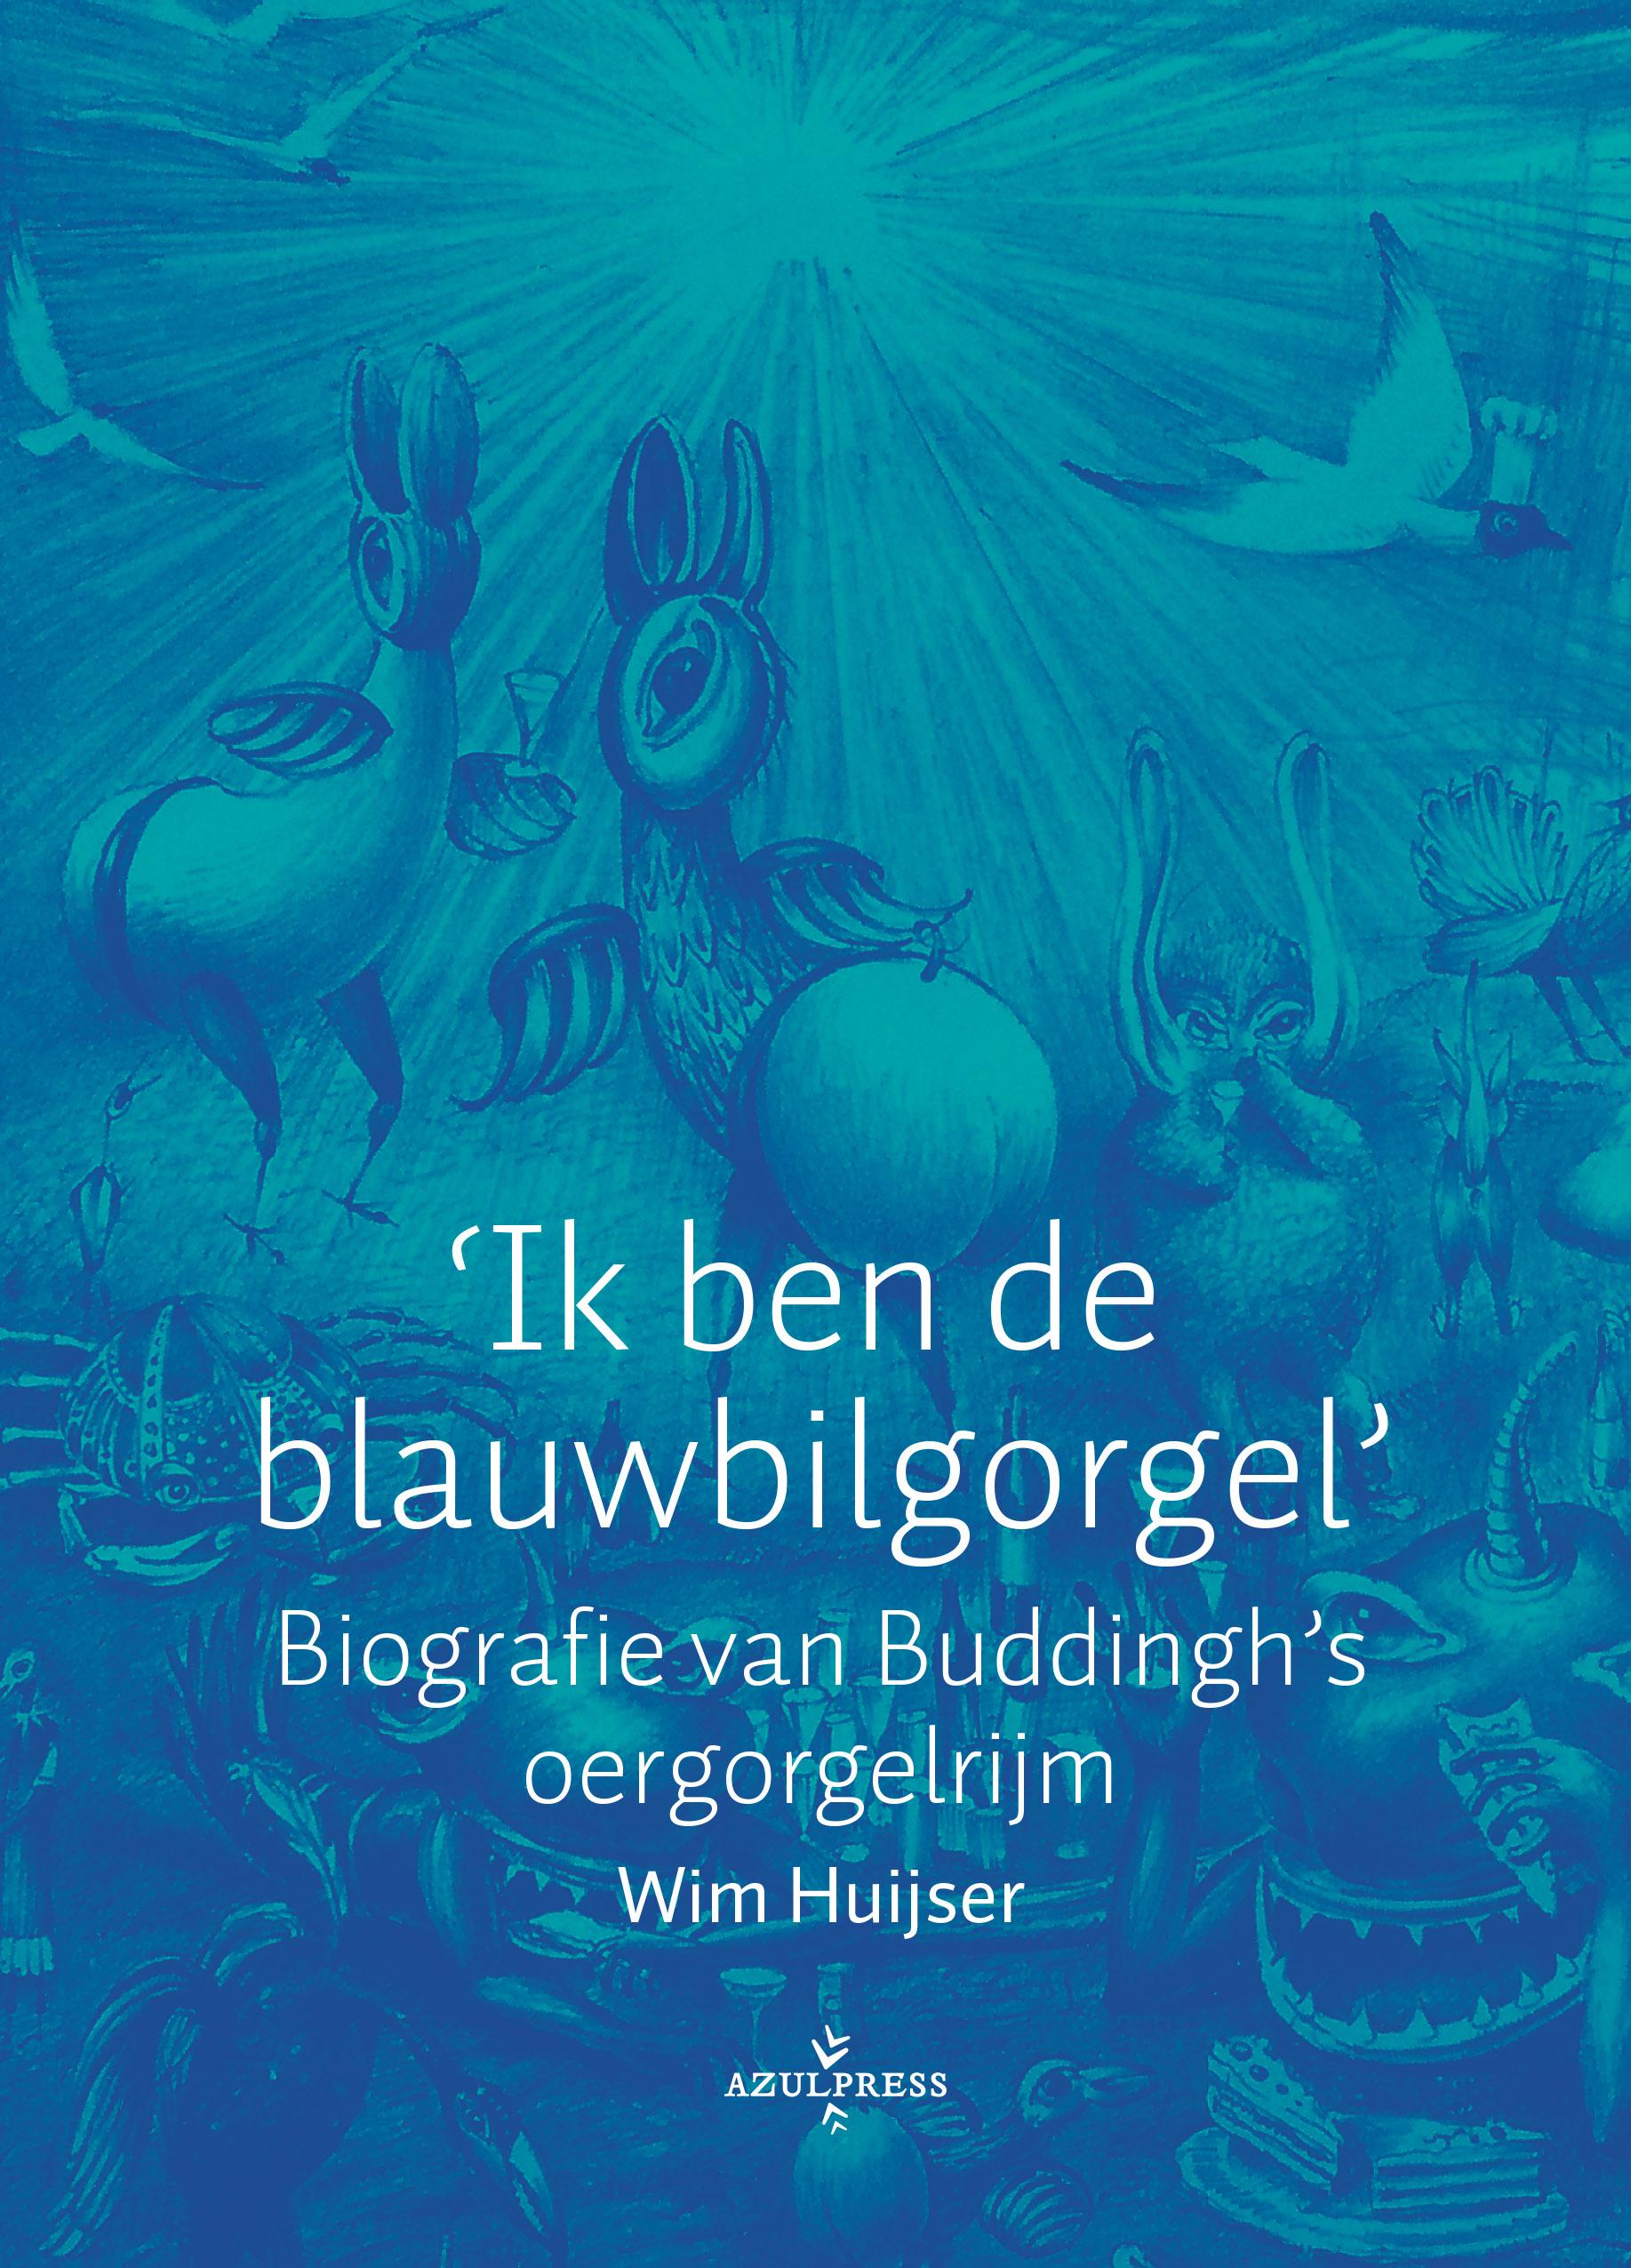 'Ik ben de blauwbilgorgel. Biografie van Buddingh's oergorgelrijm'